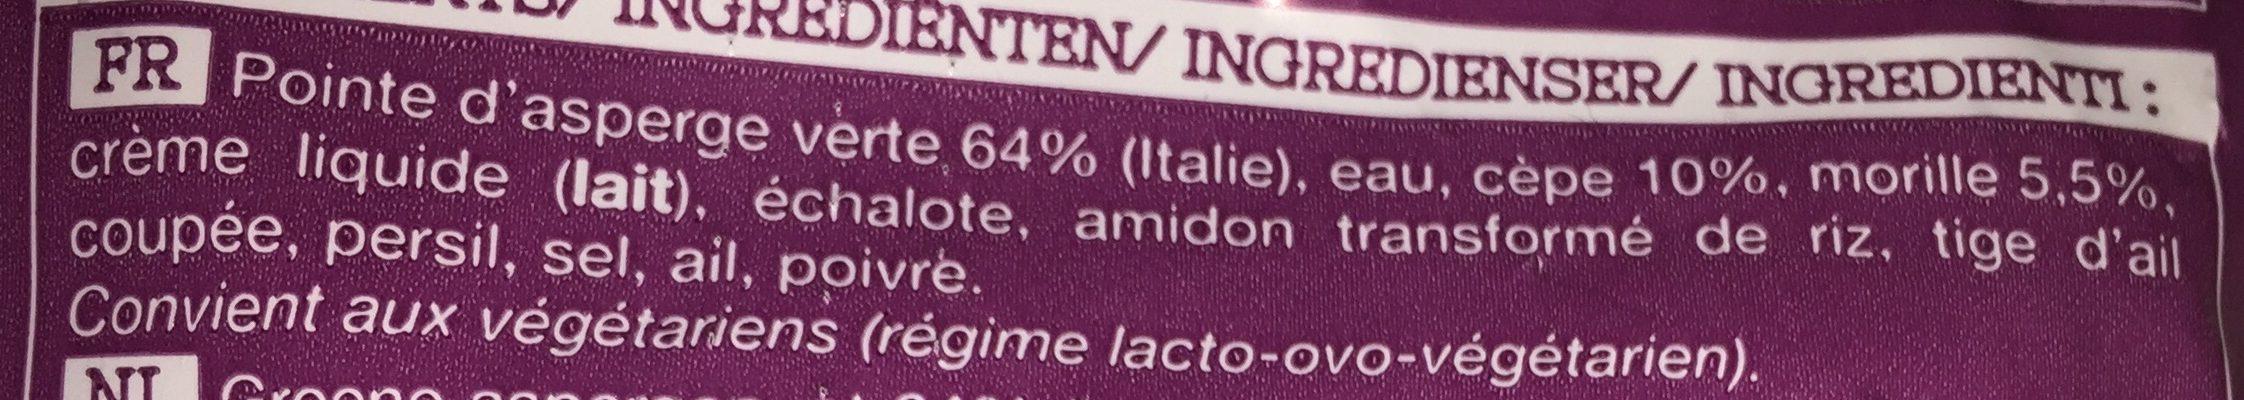 Asperges vertes cèpes - morilles - Ingrediënten - fr